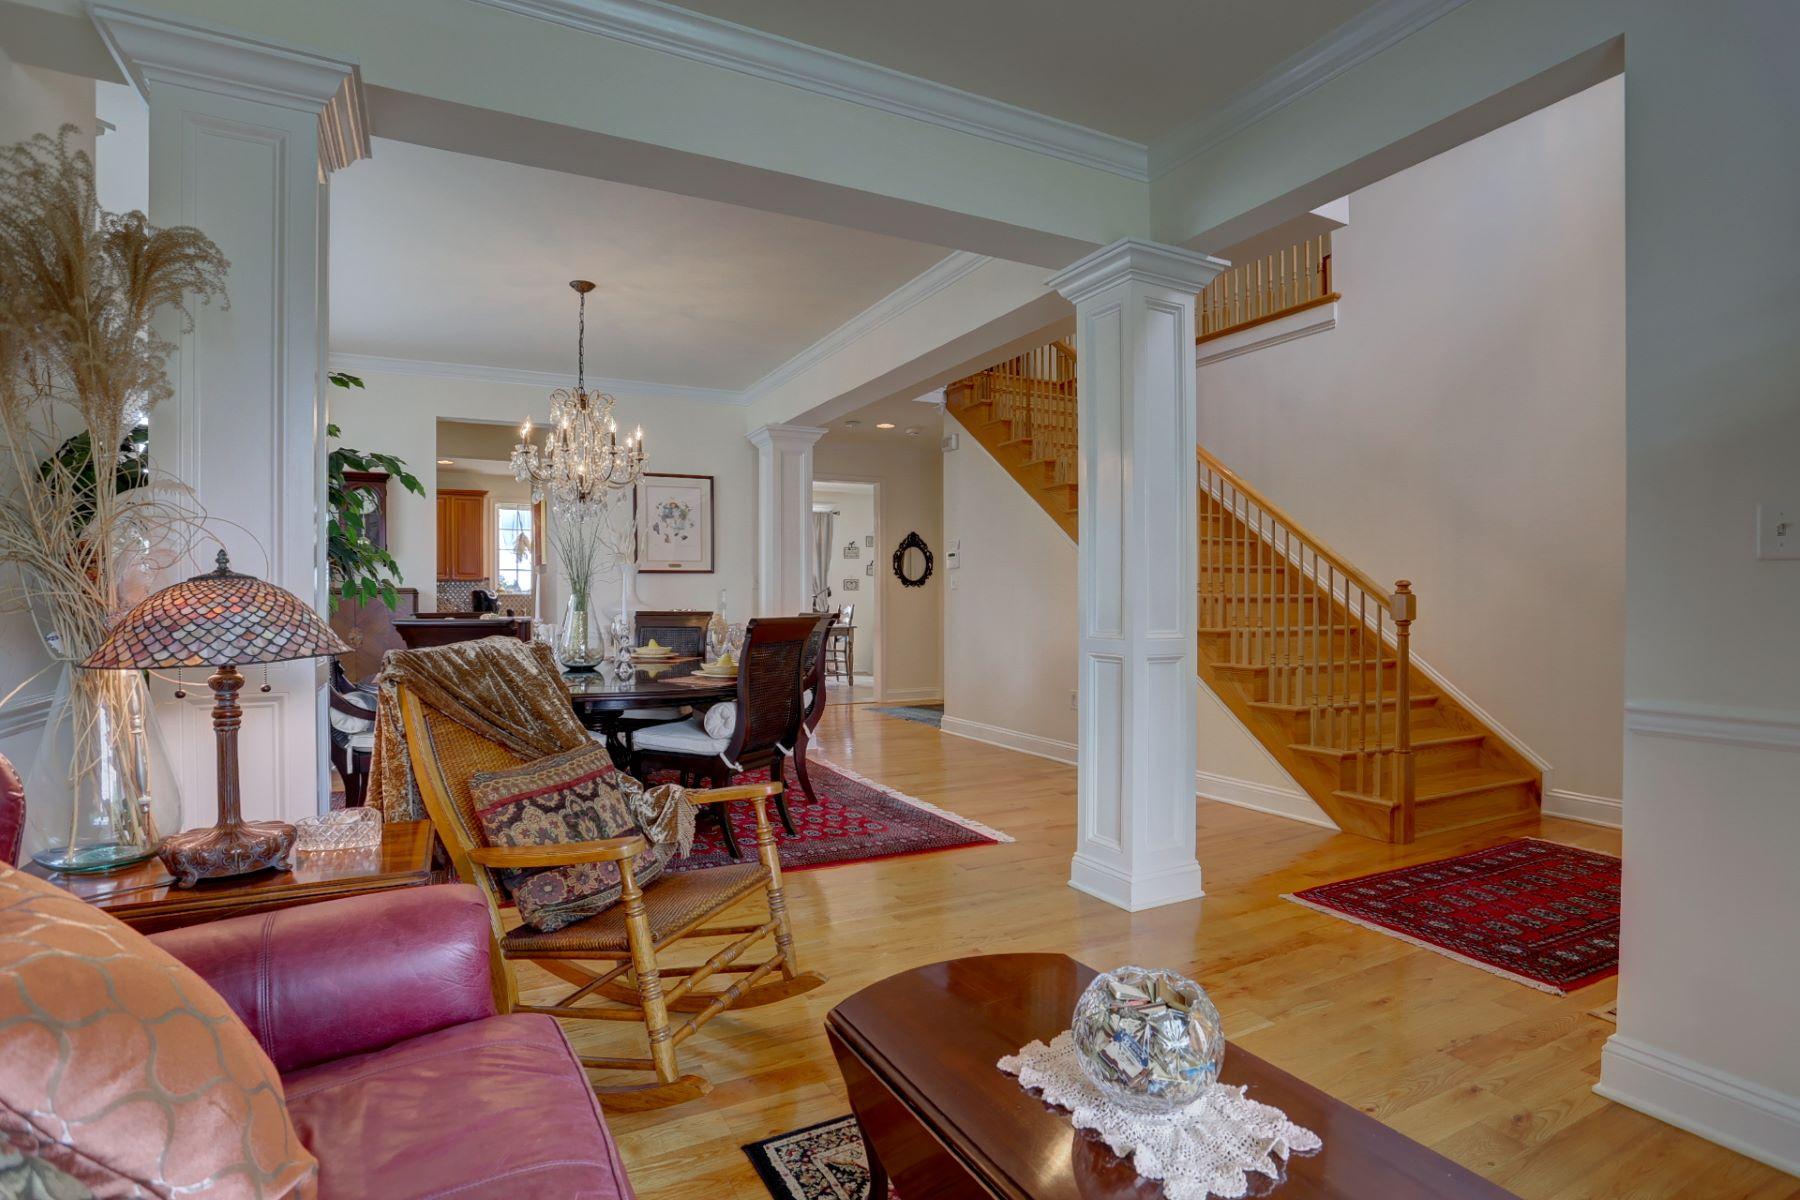 Additional photo for property listing at 308 Spurrier Drive 308 Spurrier Drive Lititz, Pennsylvania 17543 Estados Unidos